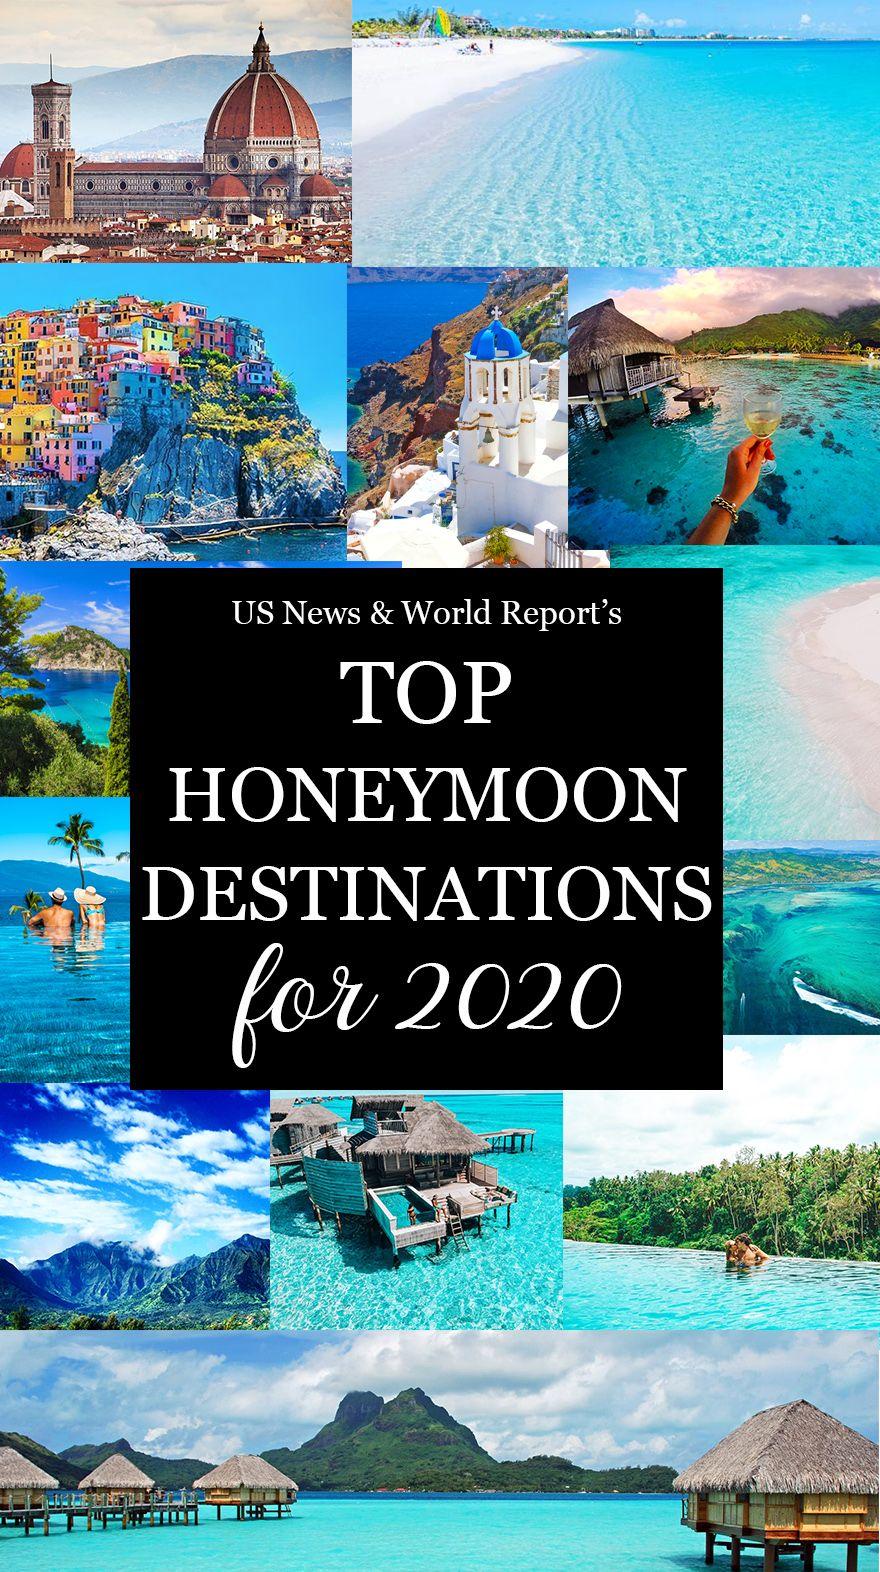 US News & World Report's Ranking Of The Best Honeymoon